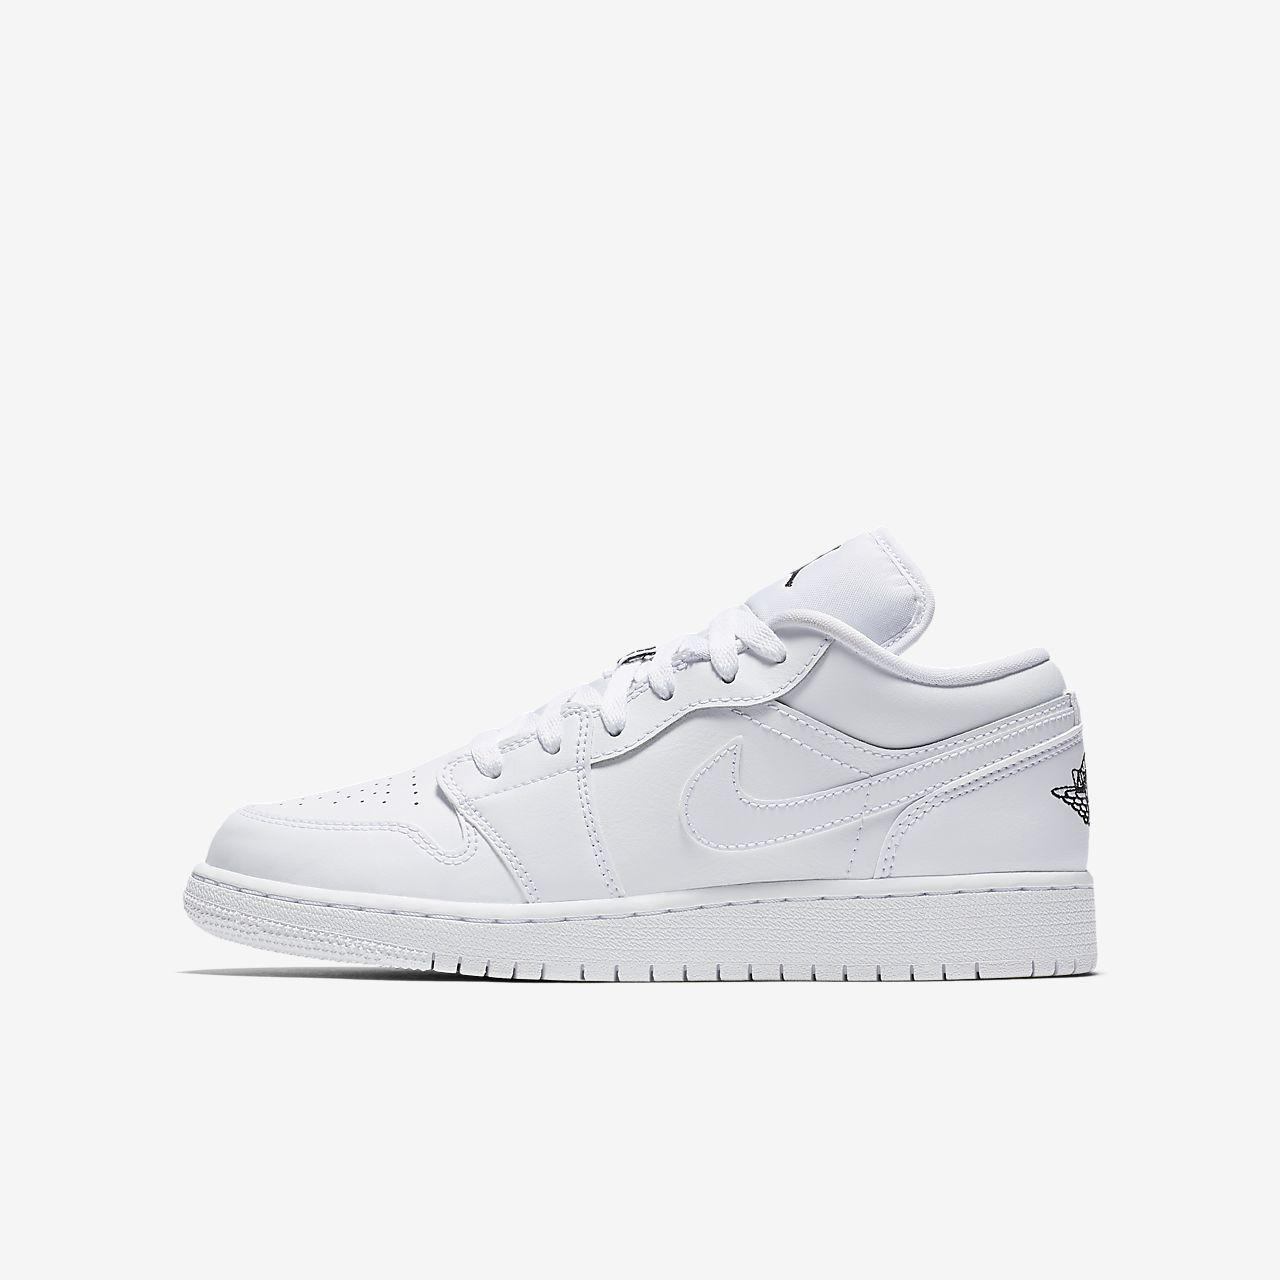 big sale 66cf4 6c2b7 ... Air Jordan 1 Low Schuh für ältere Kinder